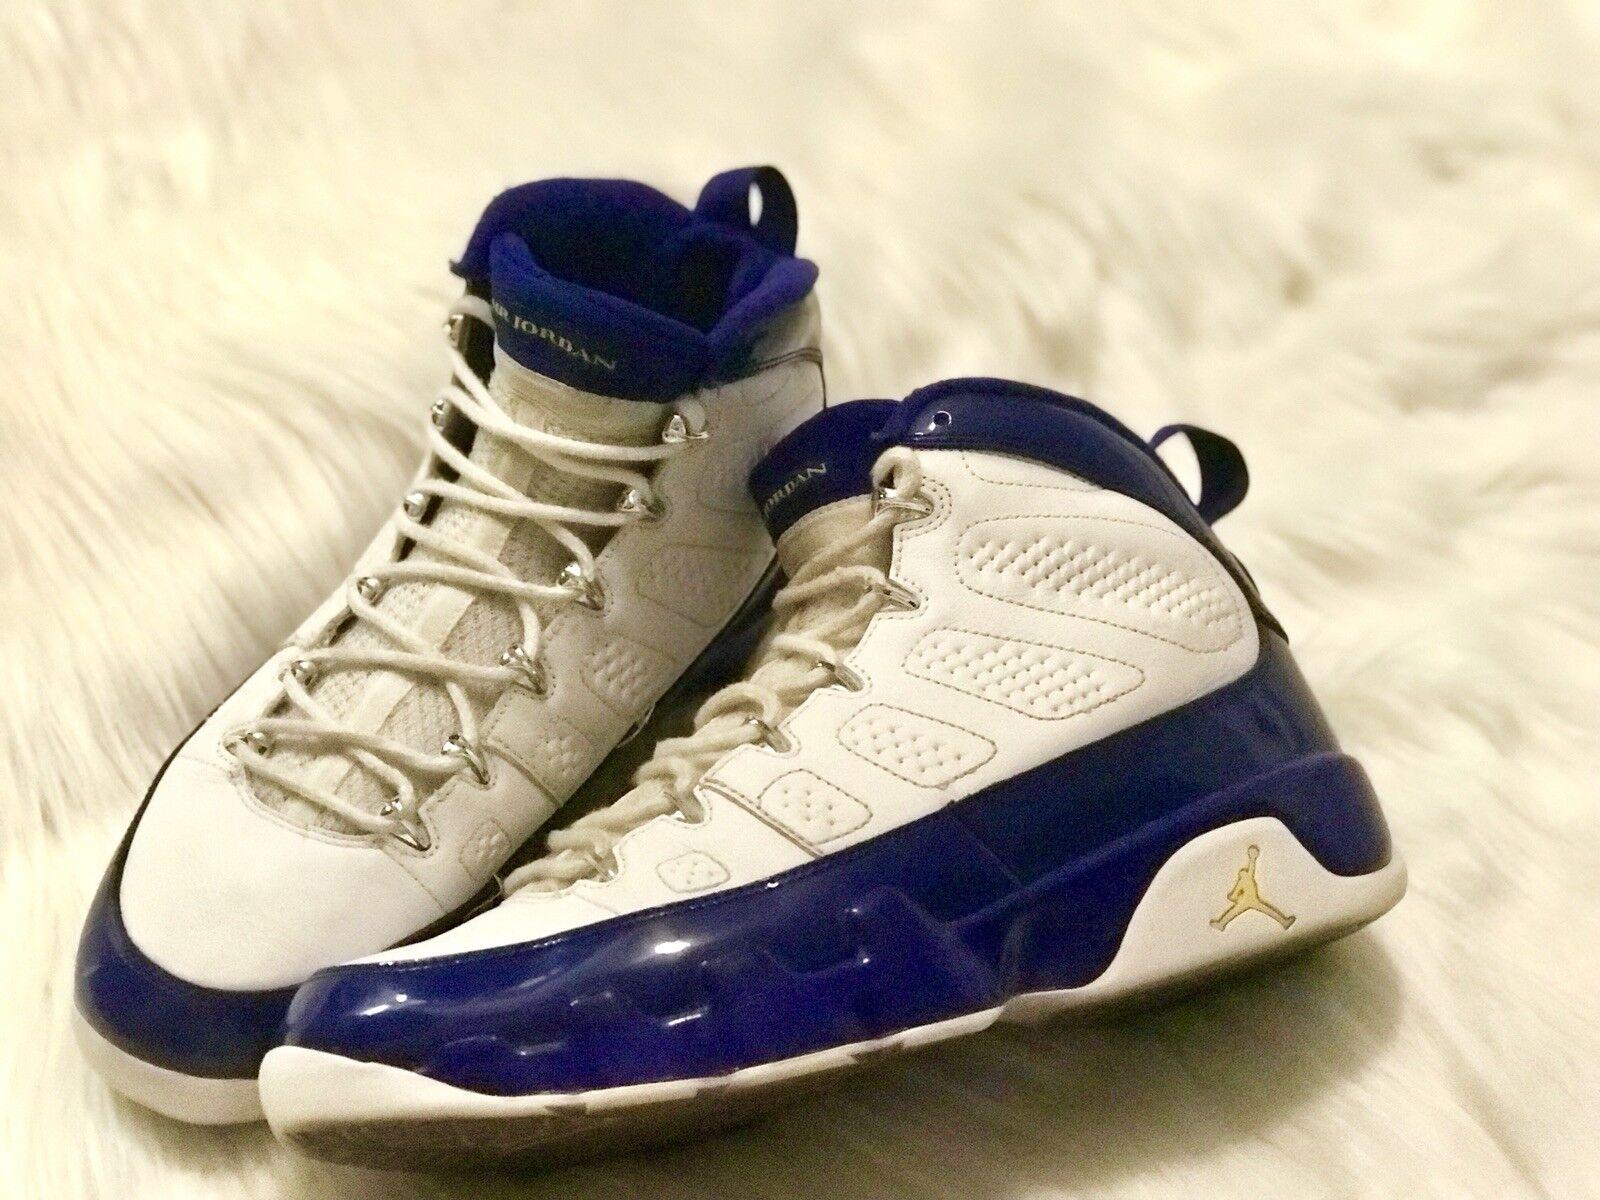 Jordan Retro 9 Kobe Bryant PE Size US 12